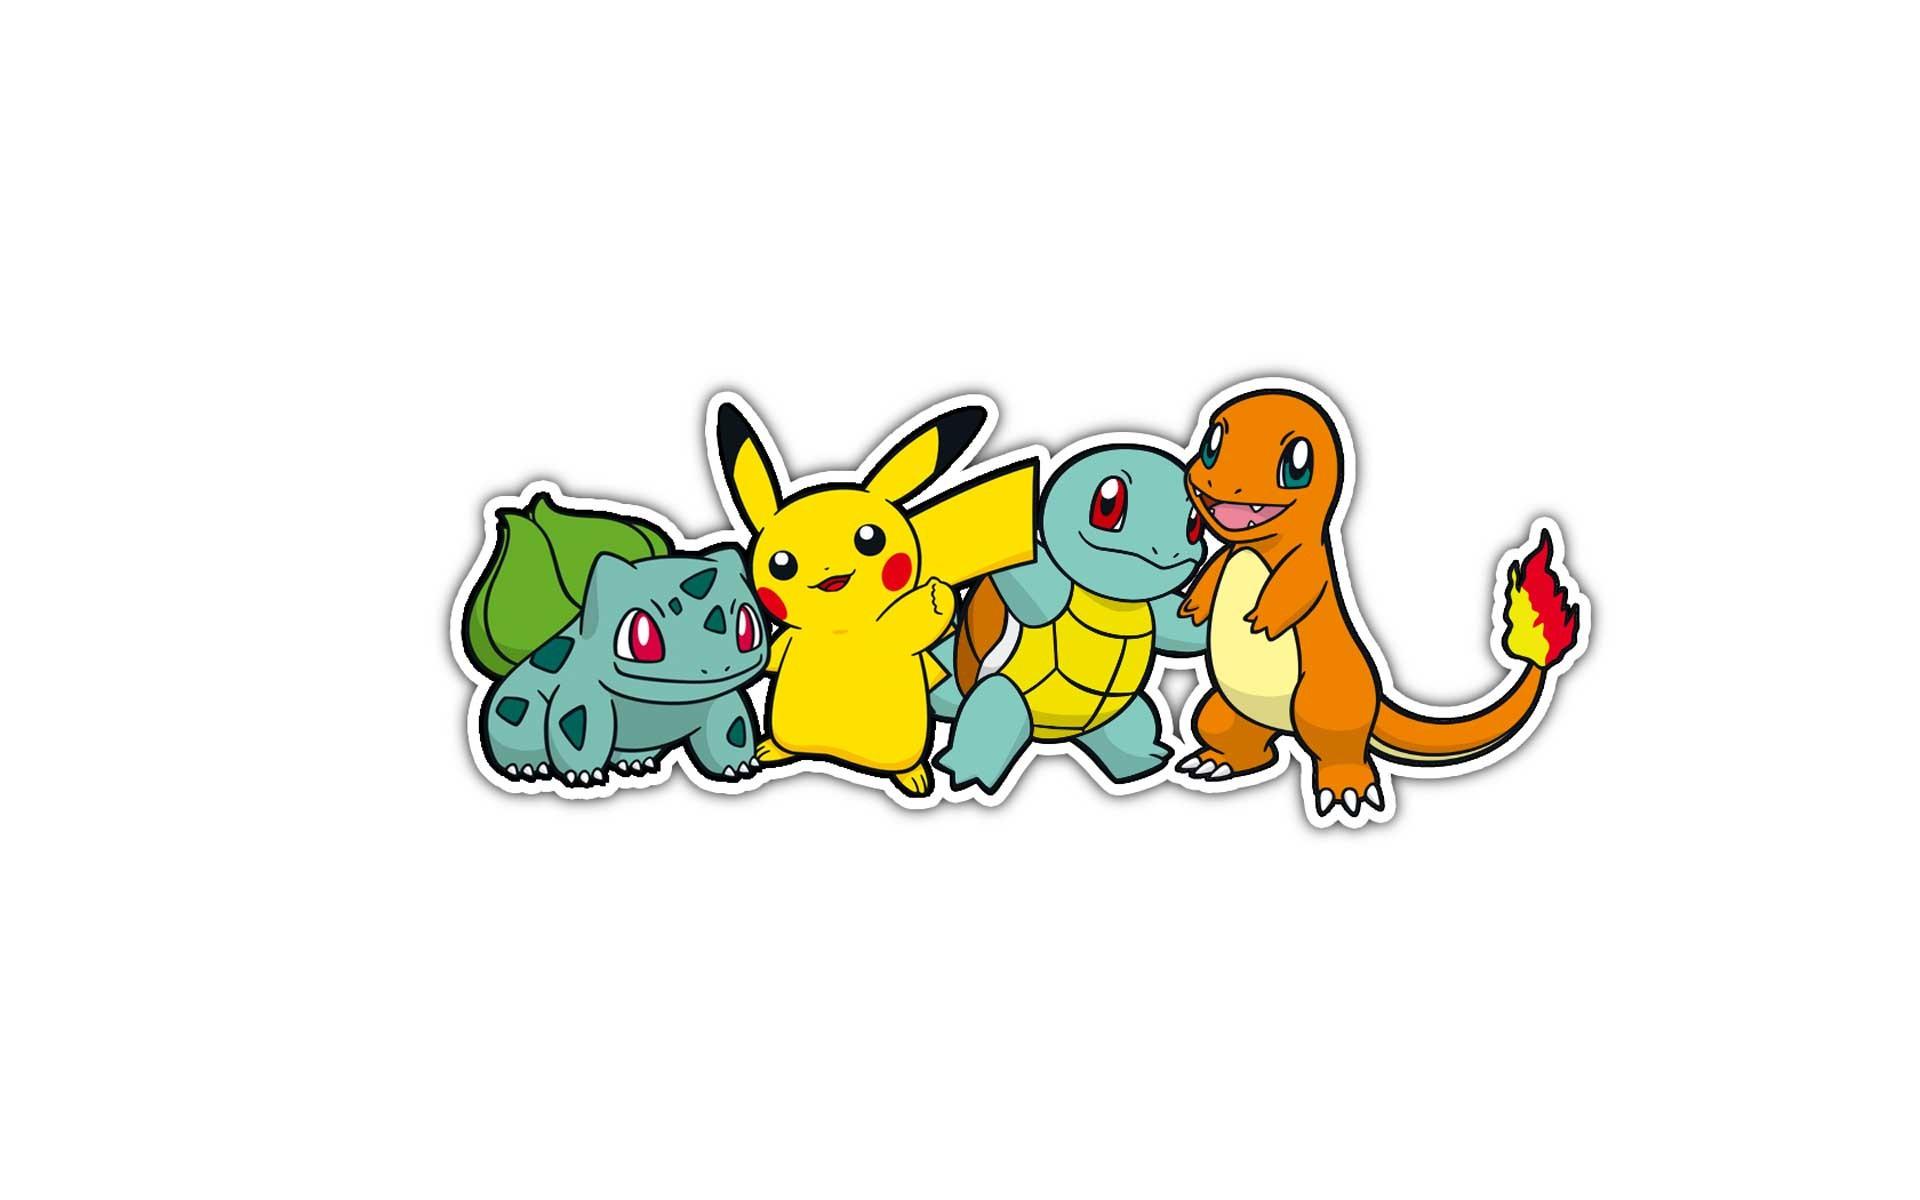 Fantastic Pokemon Wallpaper 4340